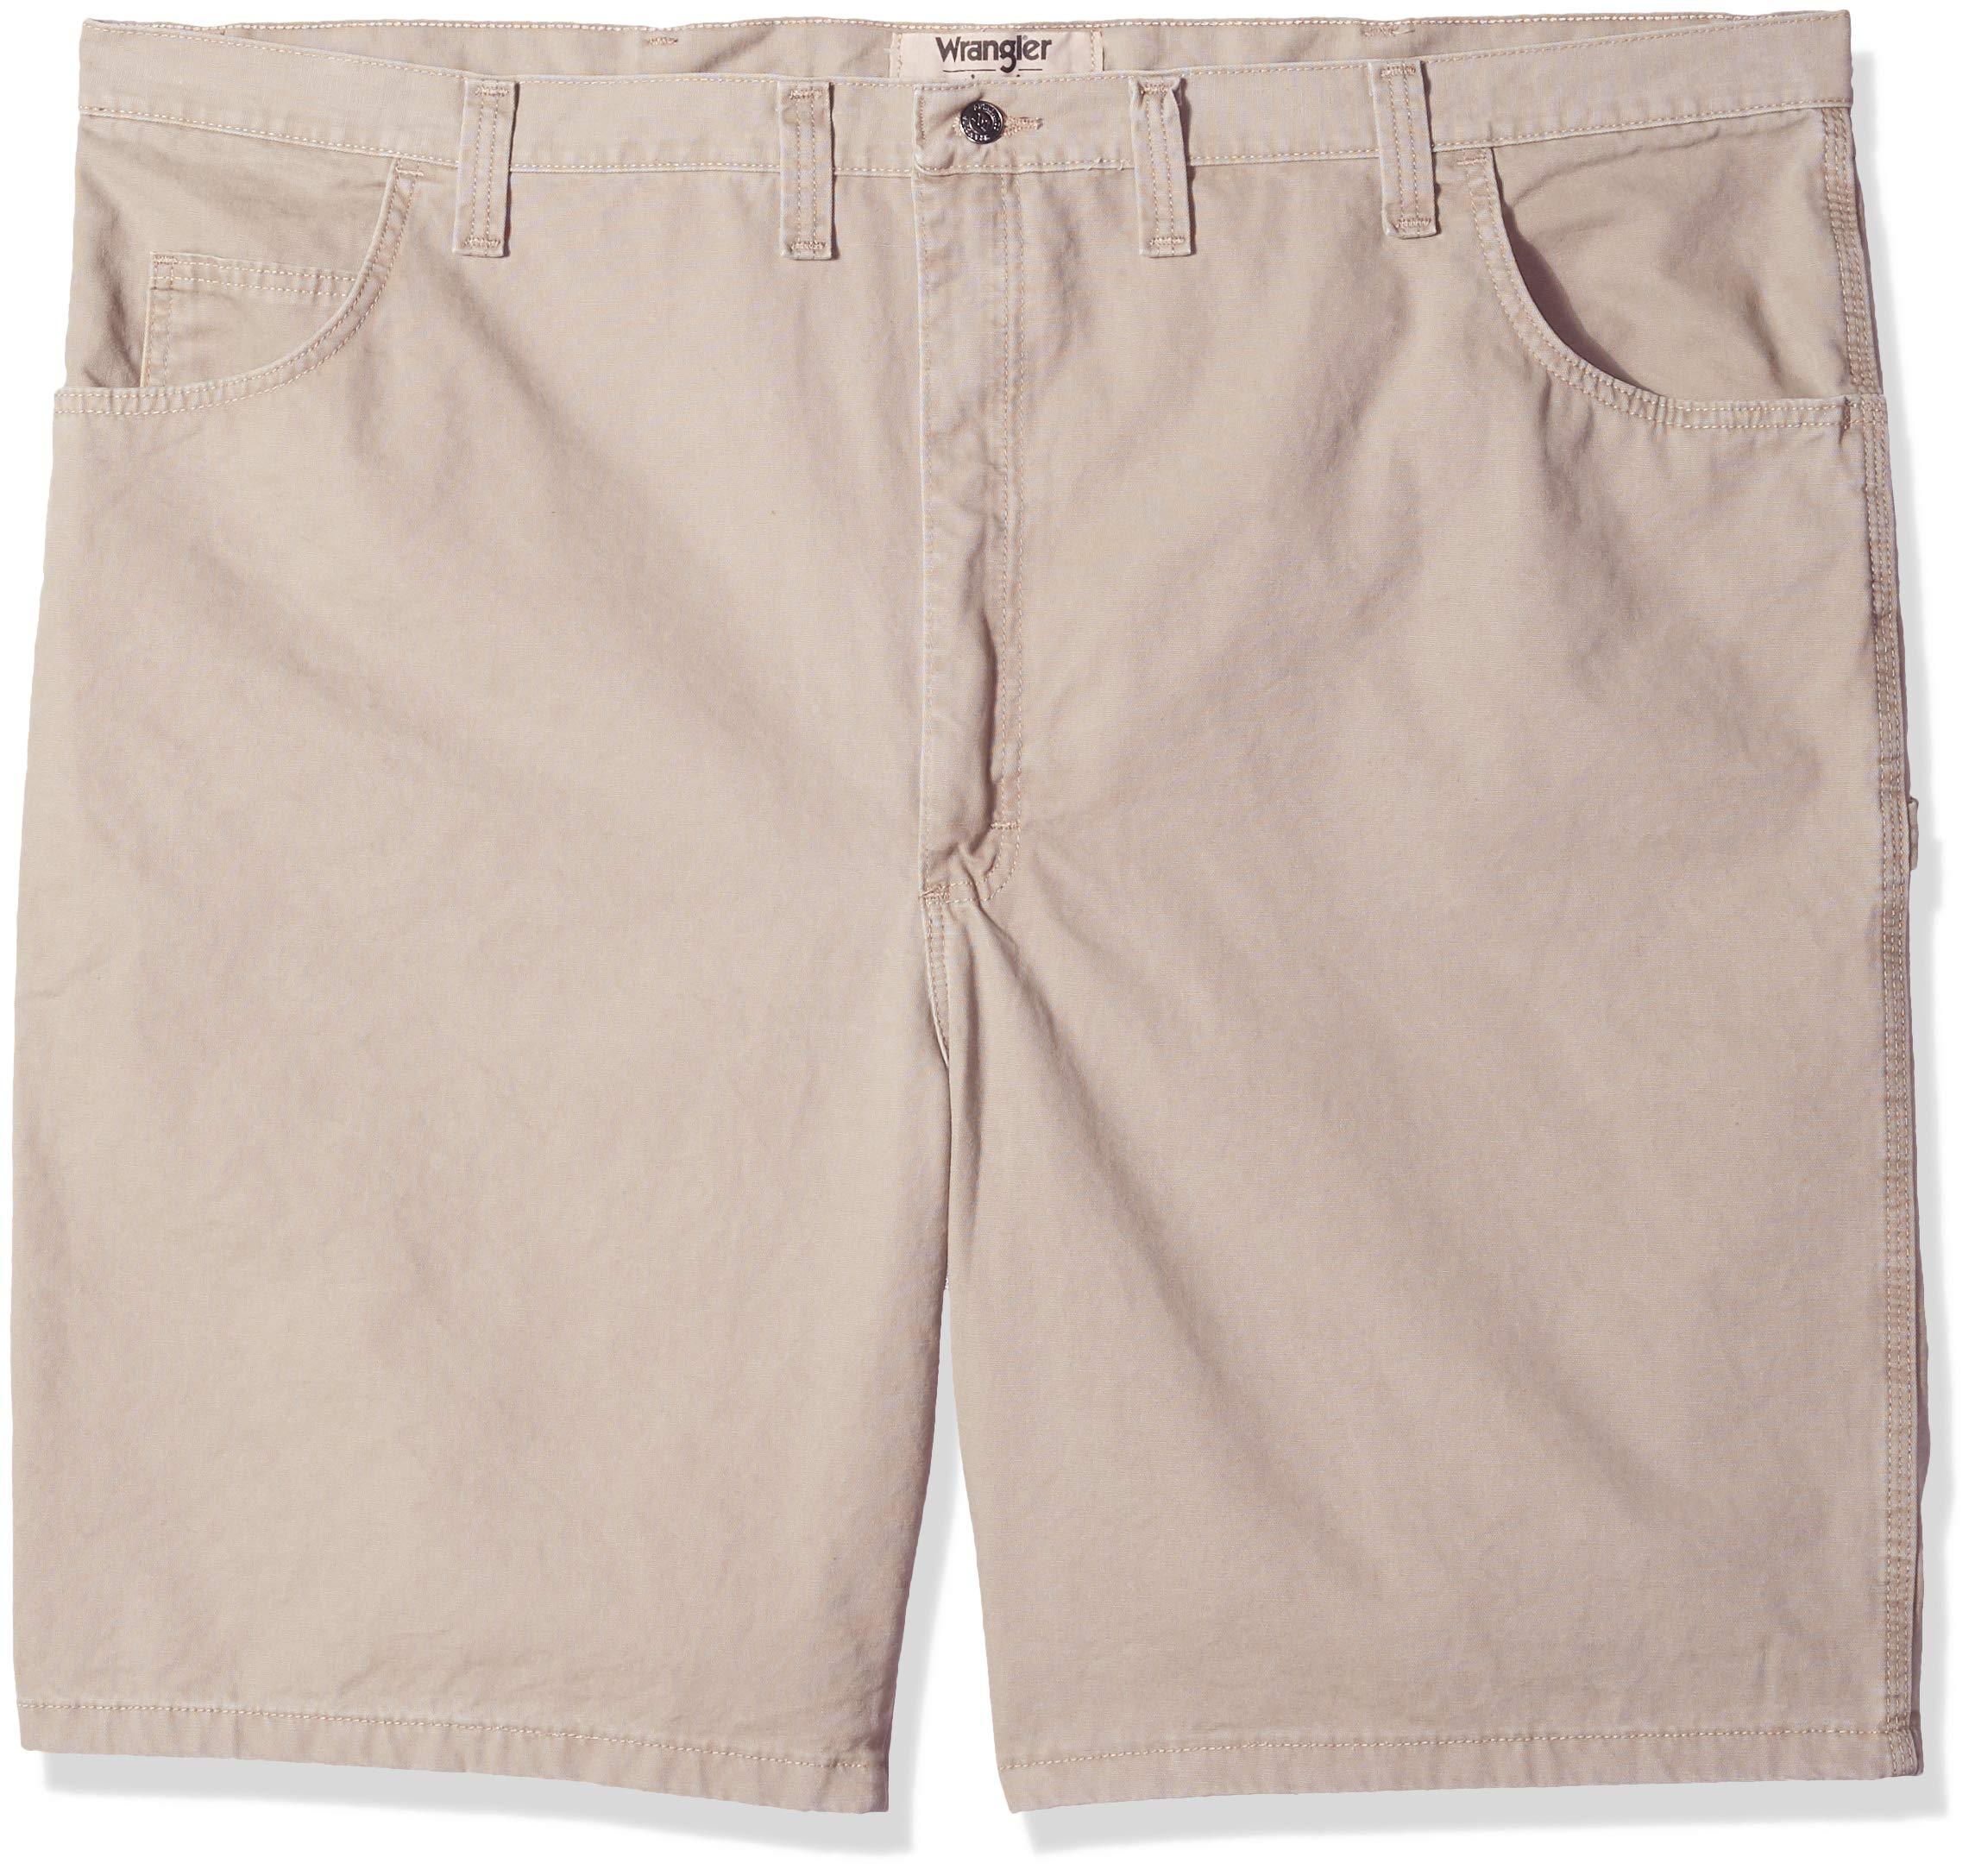 Wrangler Authentics Men's Big and Tall Loose Fit Carpenter Short, Military Khaki, 54